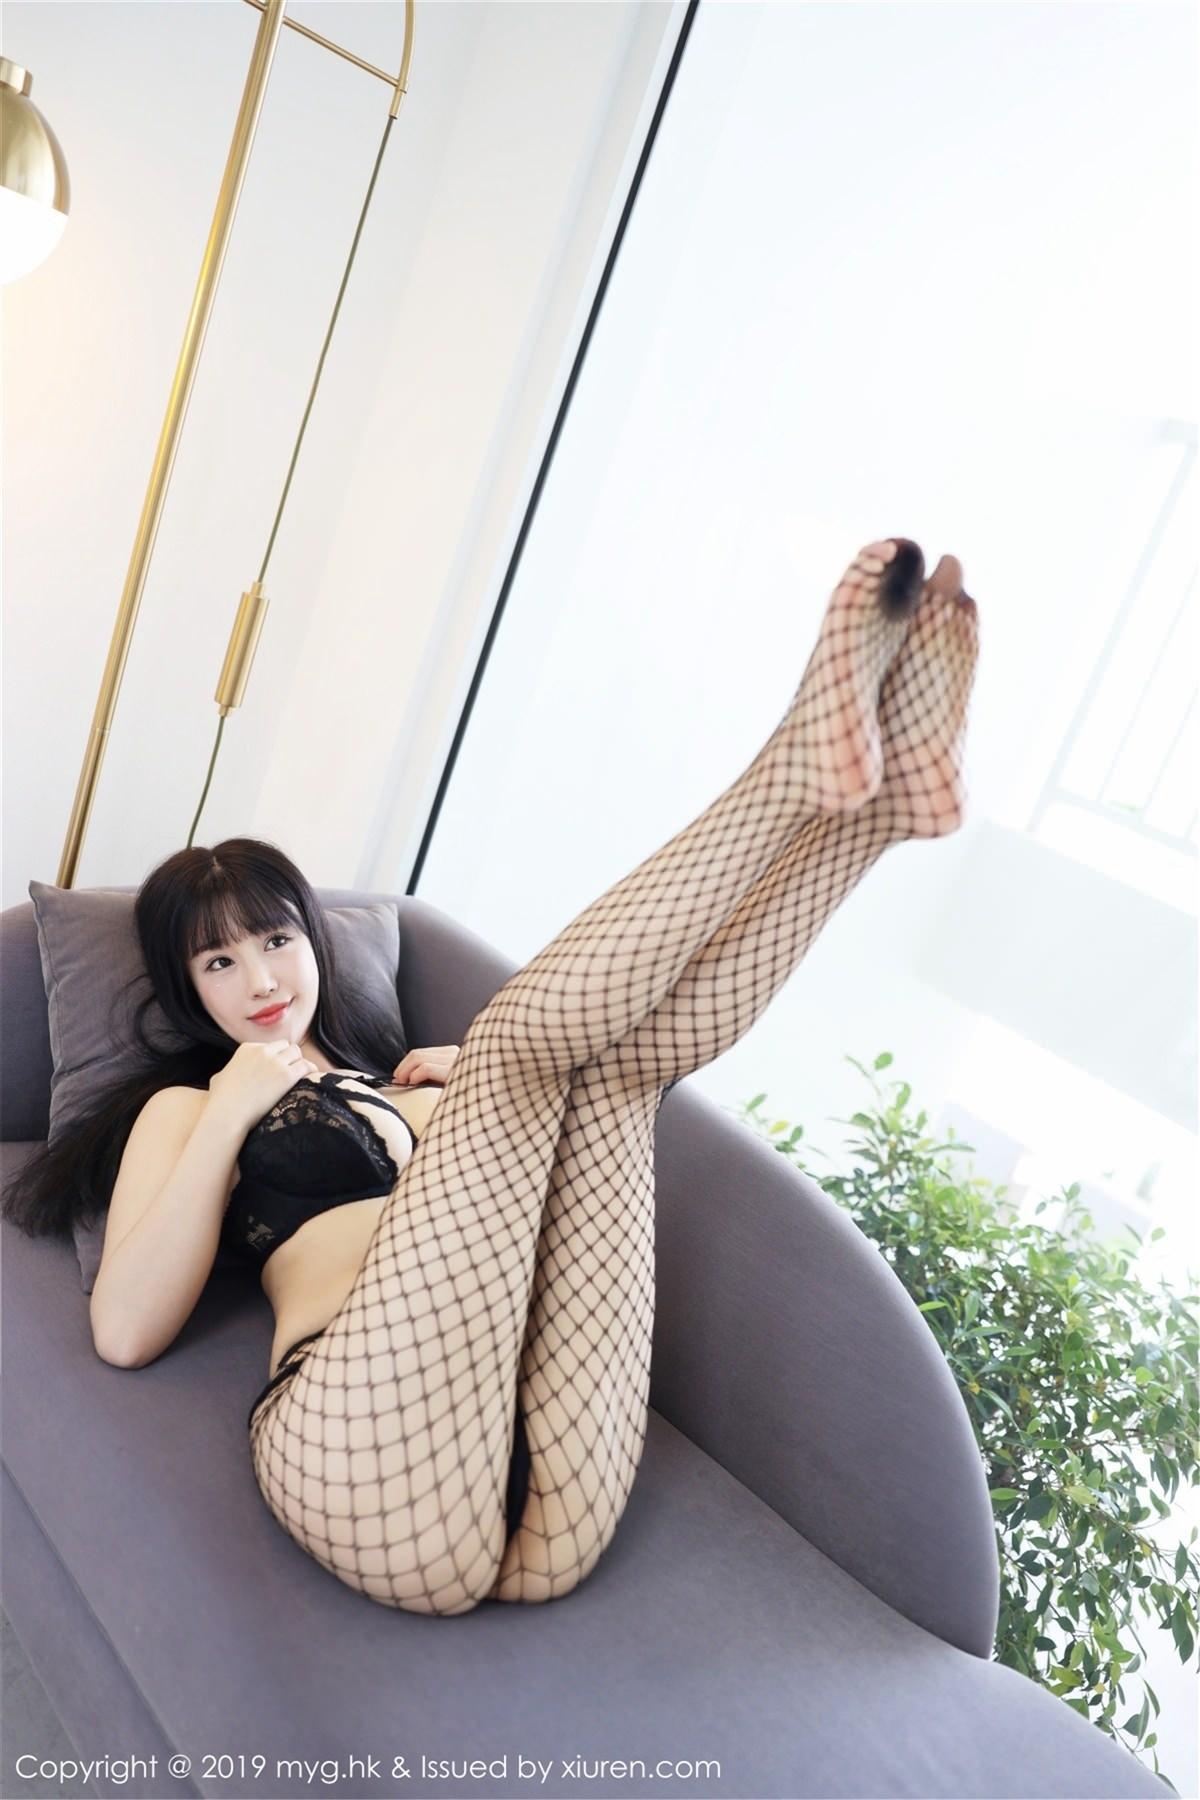 MyGirl Vol.357 30P, mygirl, Zhu Ke Er